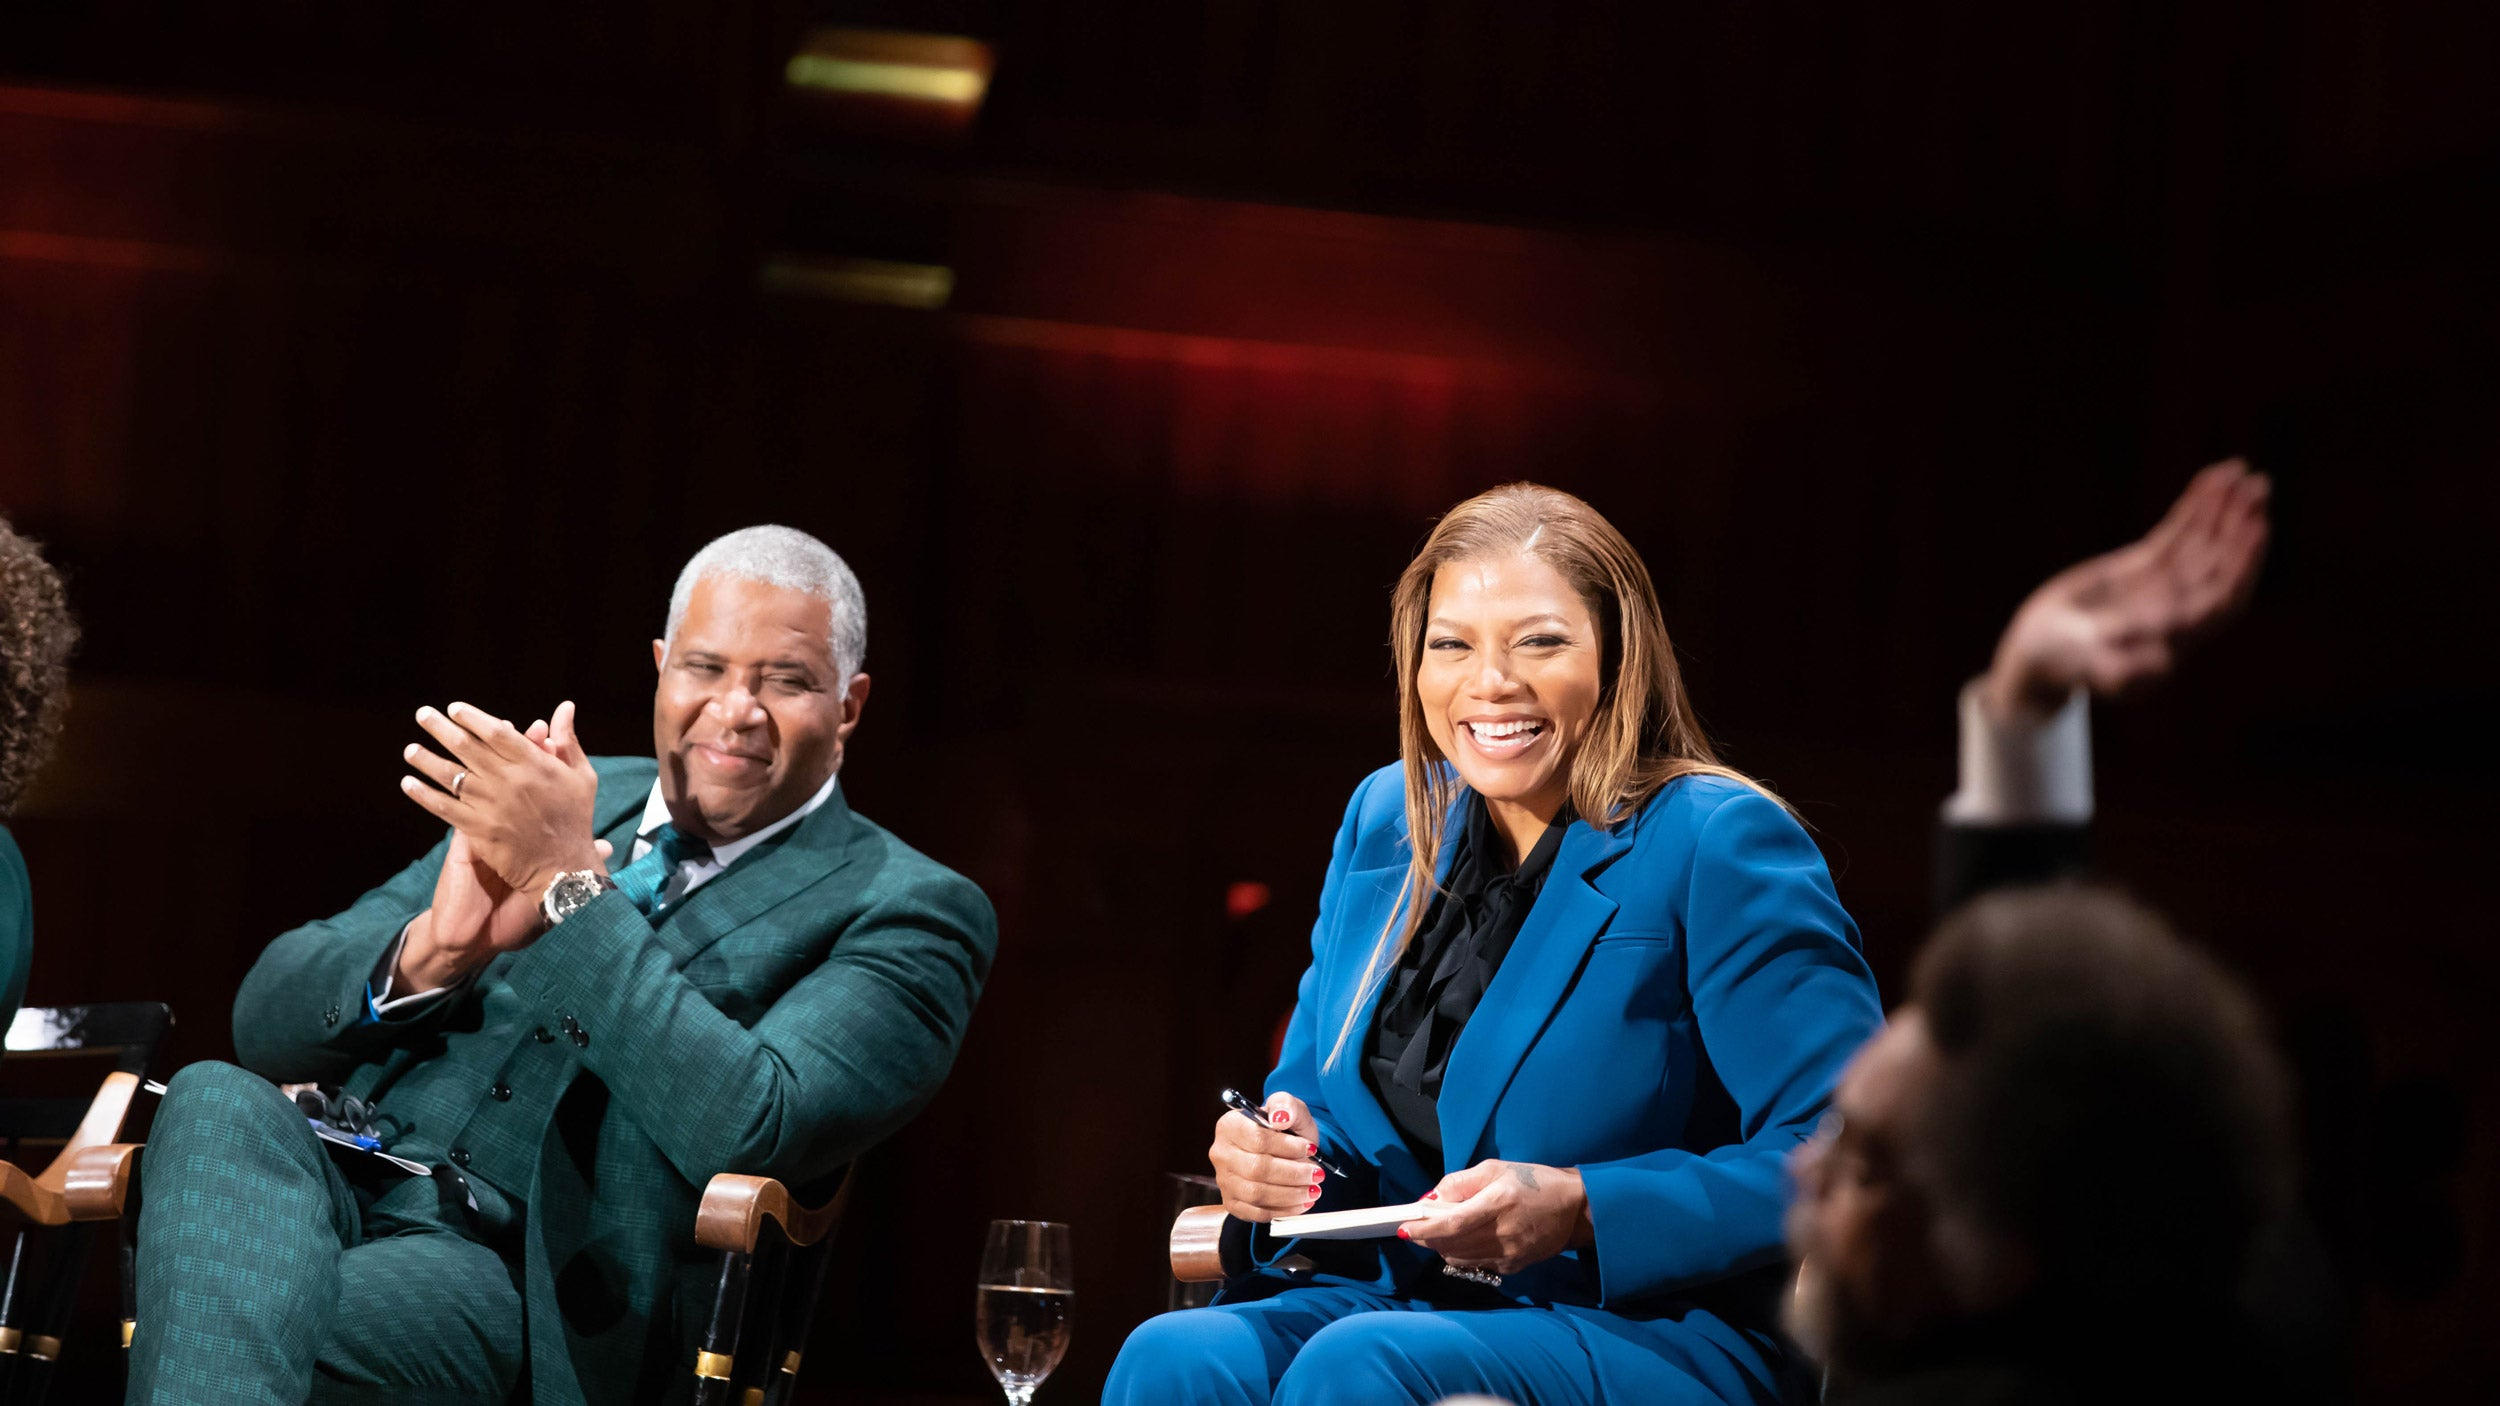 2019 Du Bois Medal recipients celebrate black excellence, opportunity